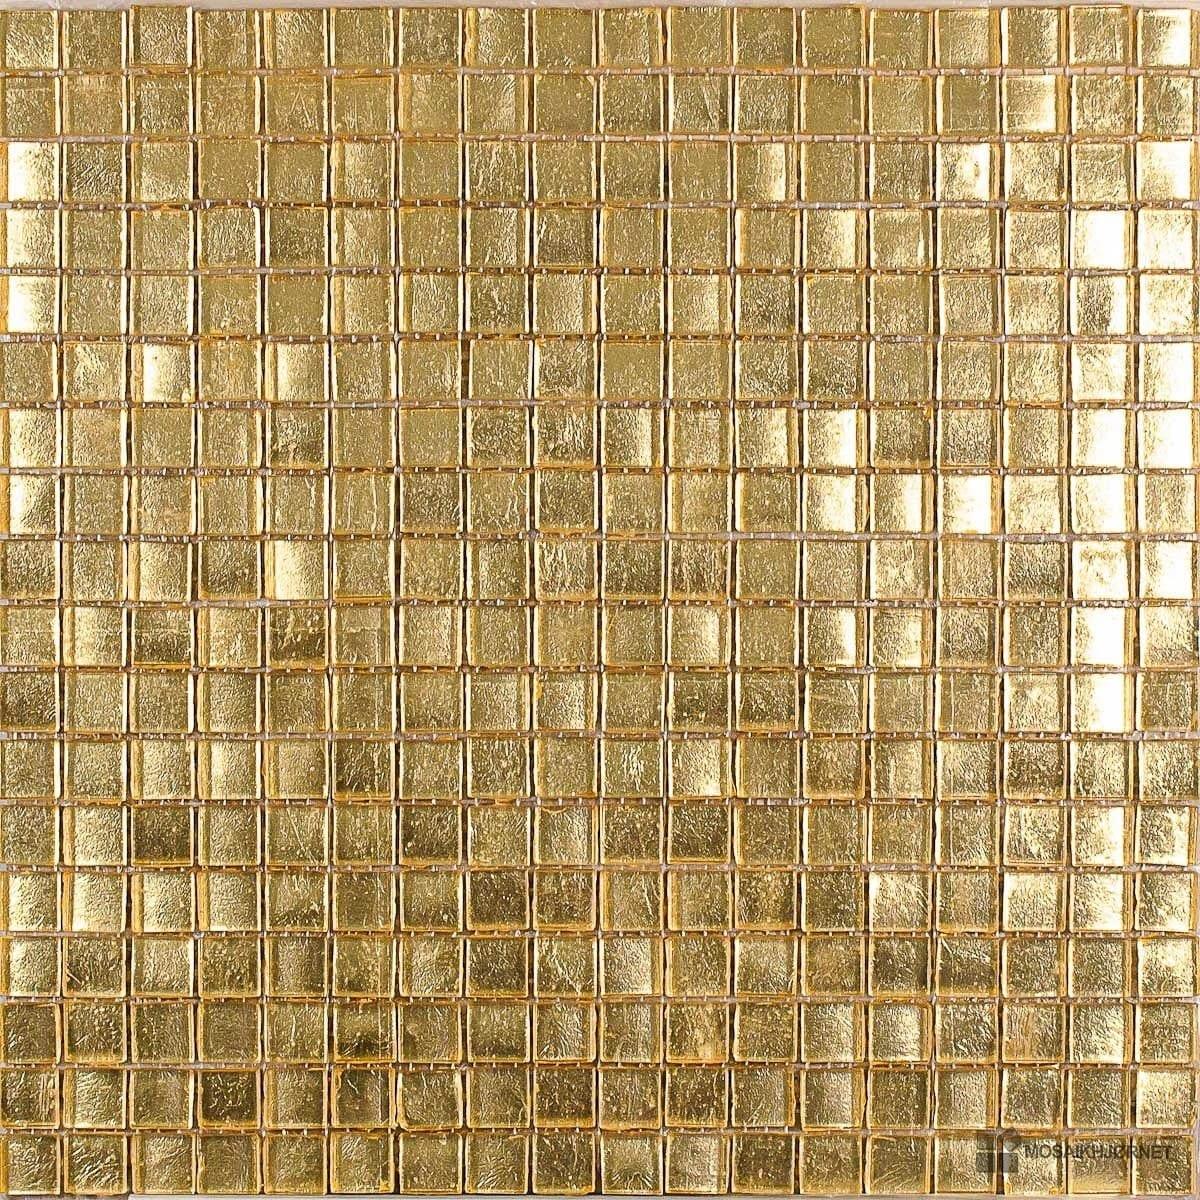 Oroantico Guld 1 4x1 4 Mosaikhj 248 Rnet Fliser Klinker